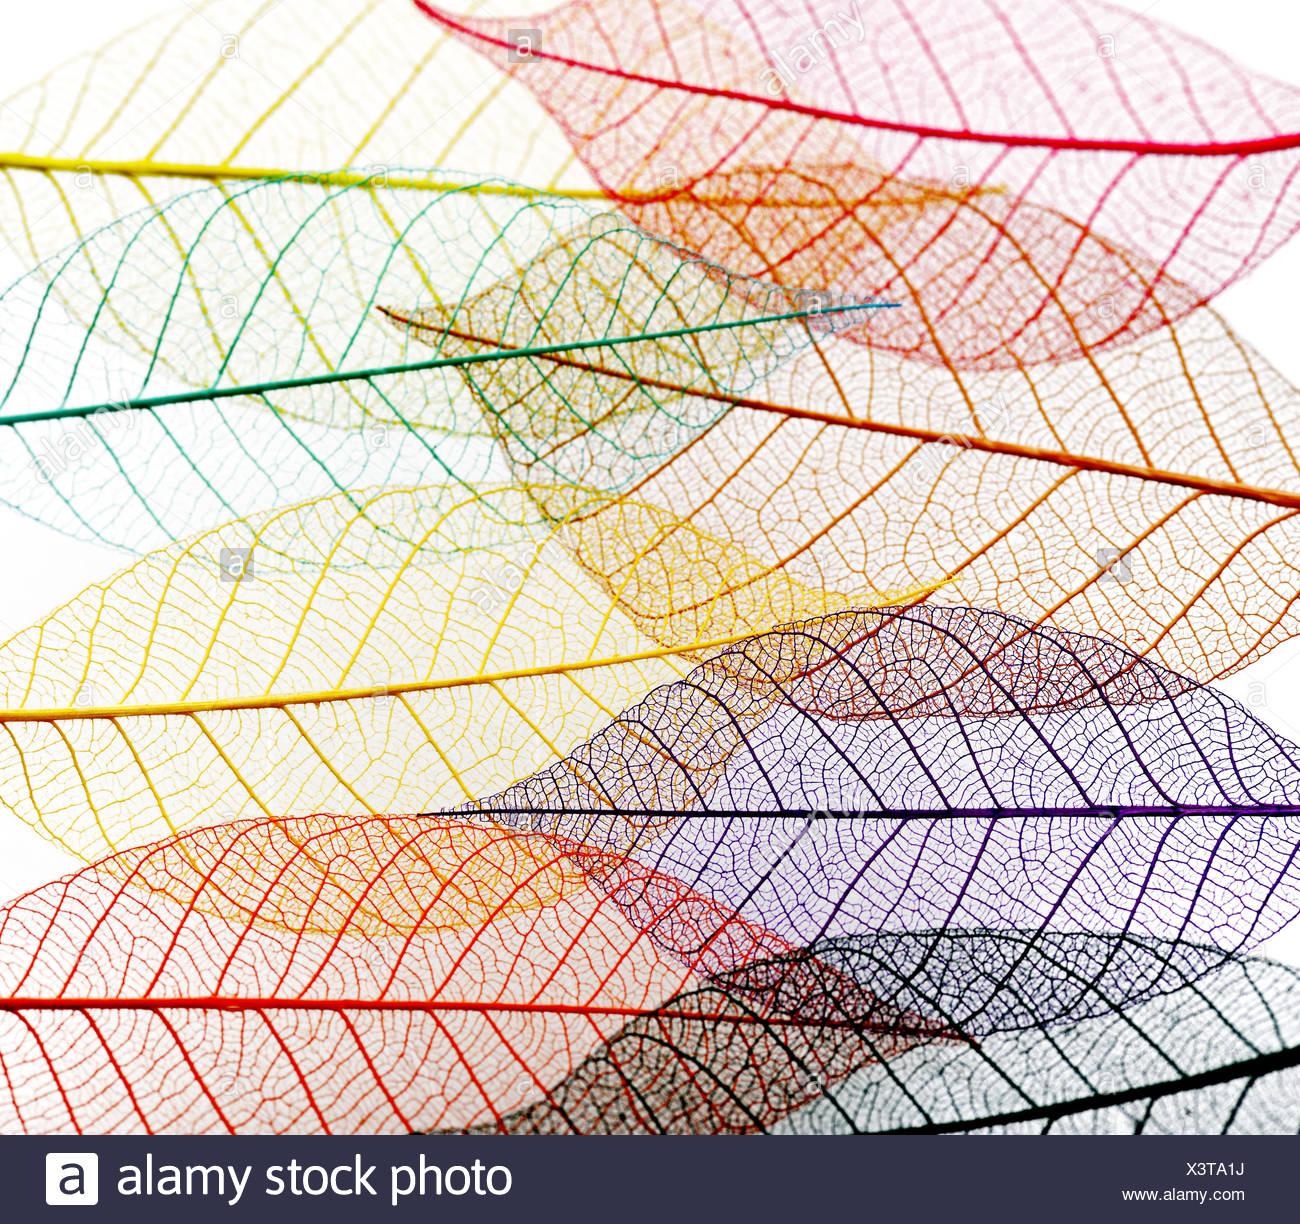 Transparent Skeleton Leaves - Stock Image